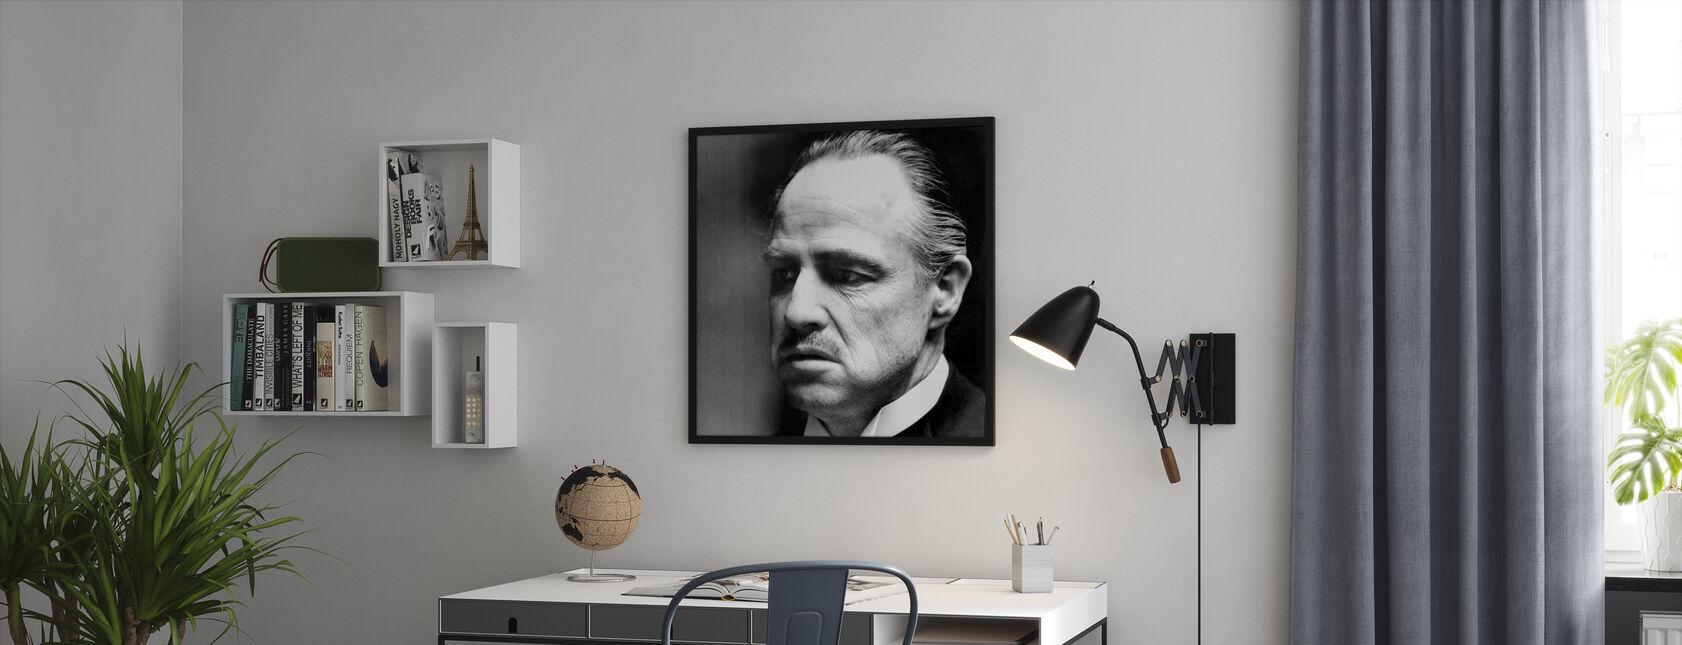 De peetvader - Don Vito Corleone - Ingelijste print - Kantoor